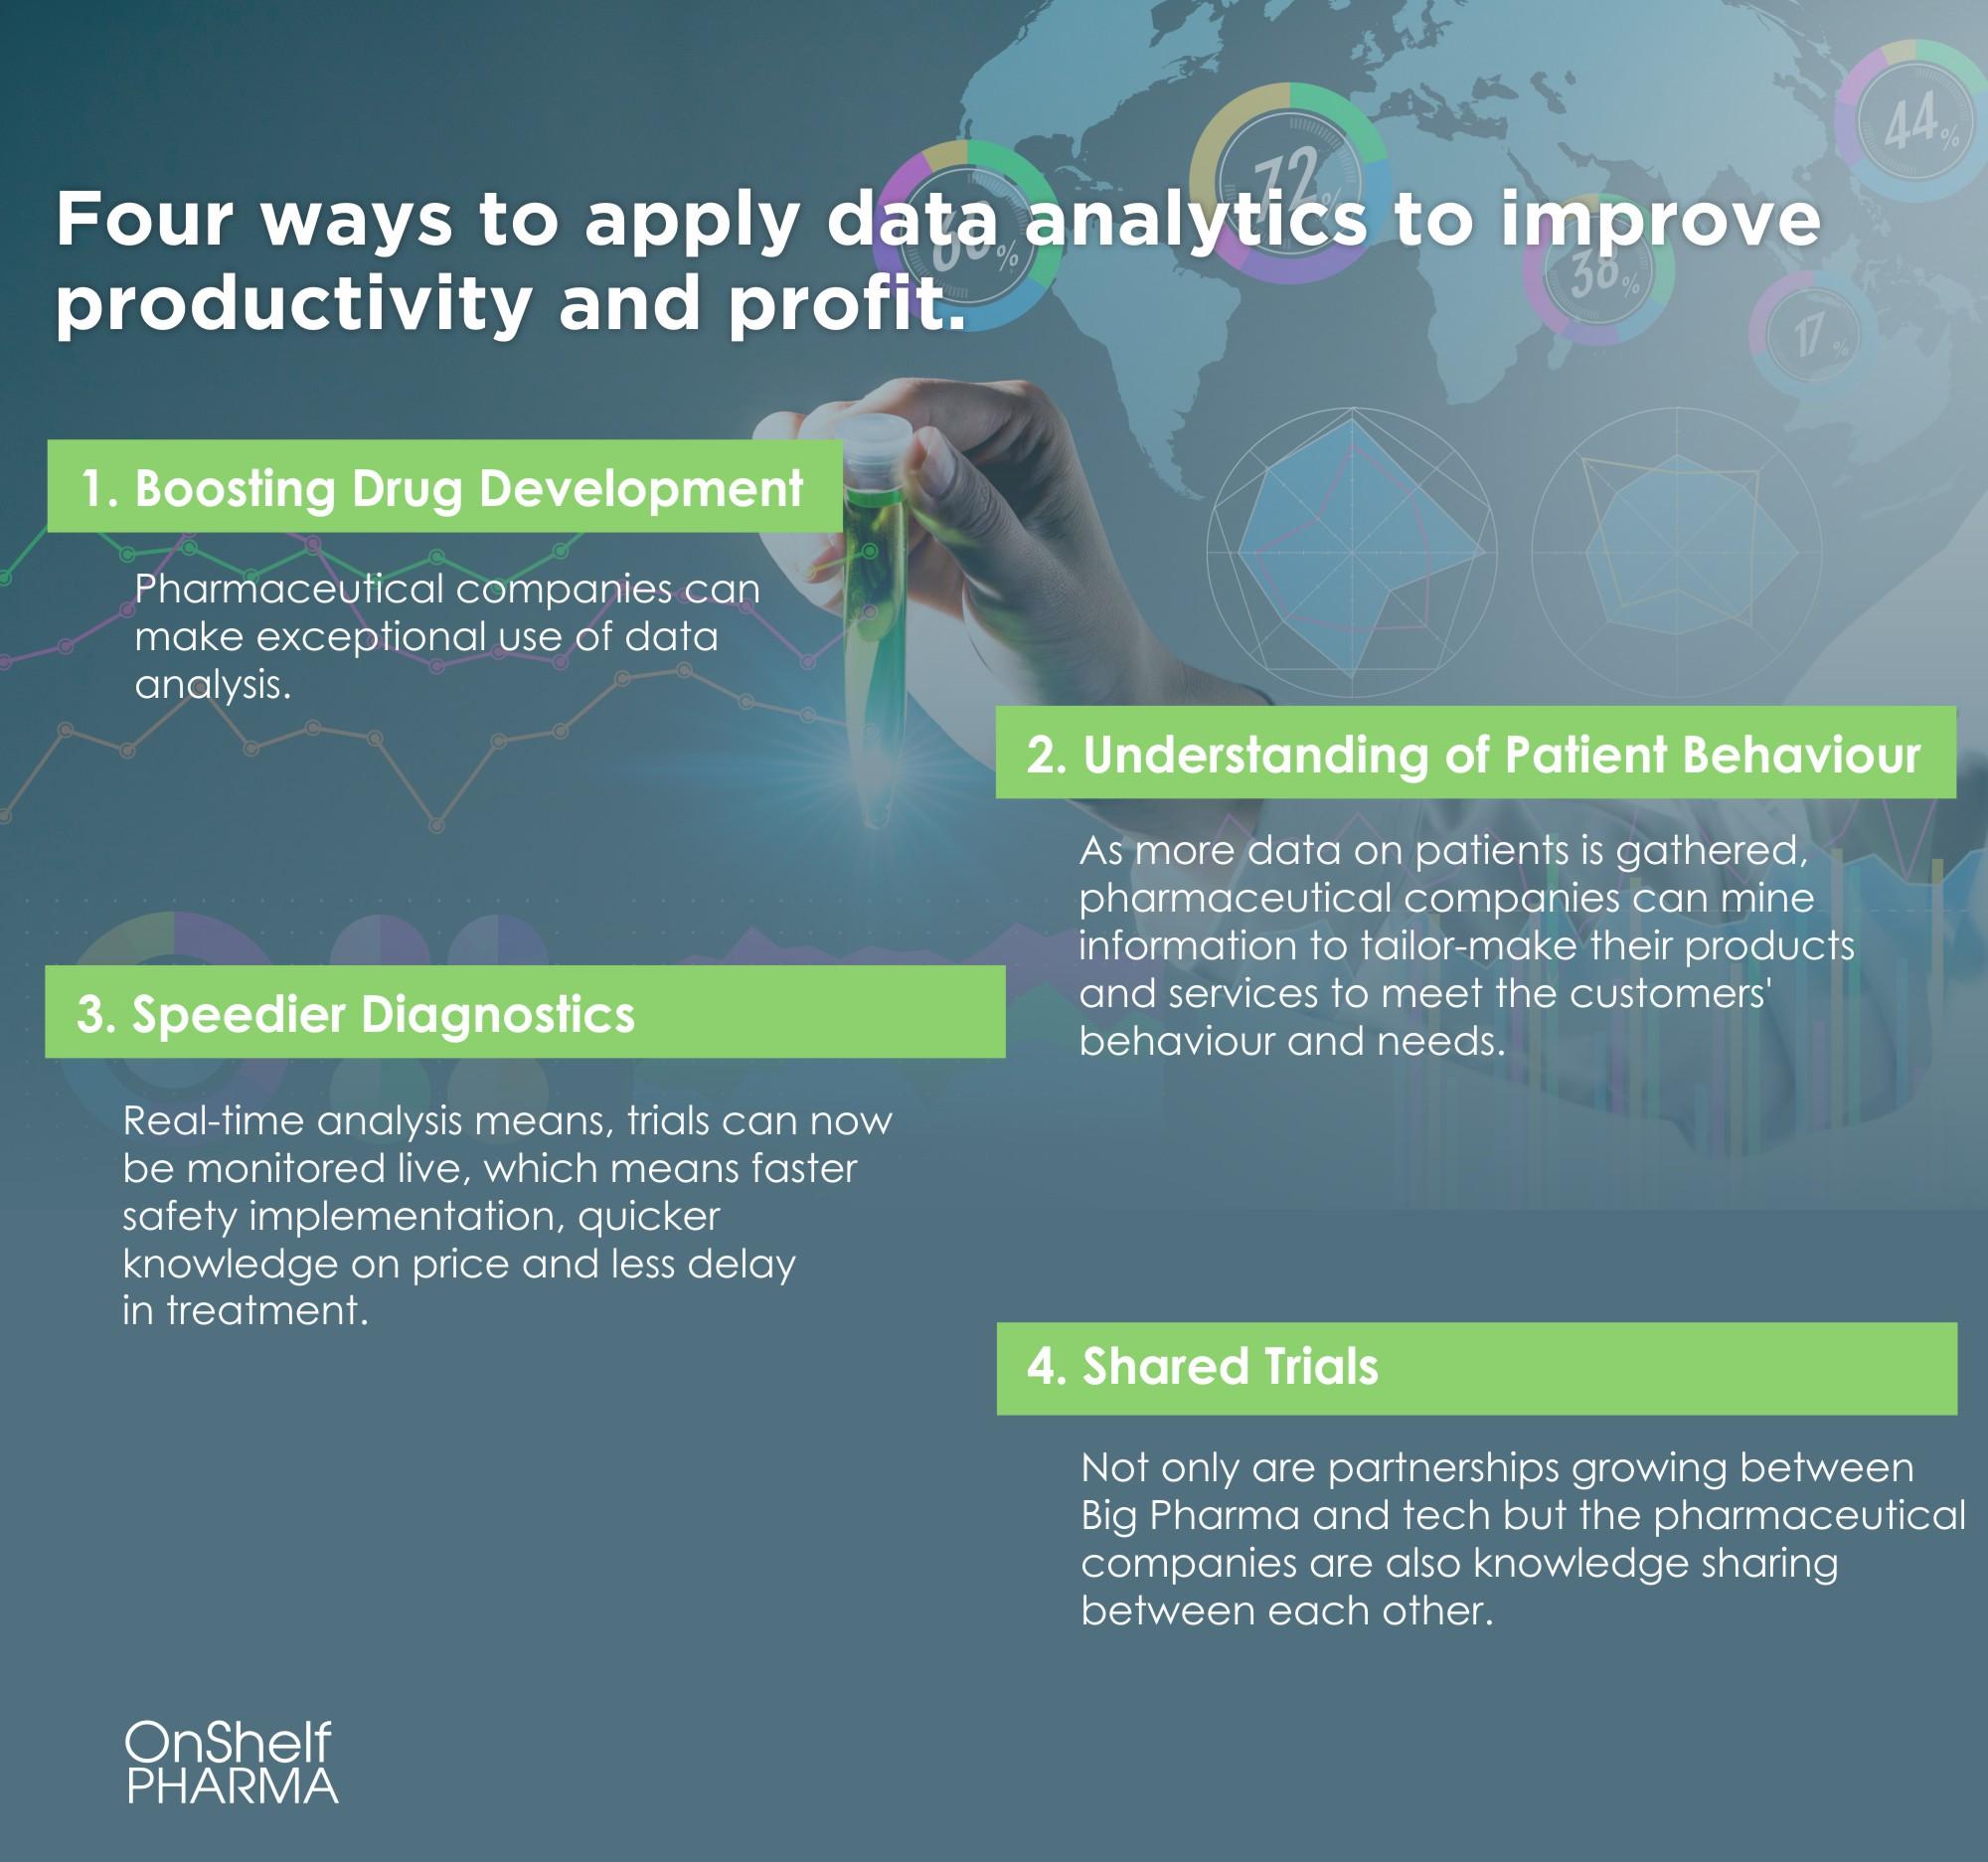 onshelf pharma big data